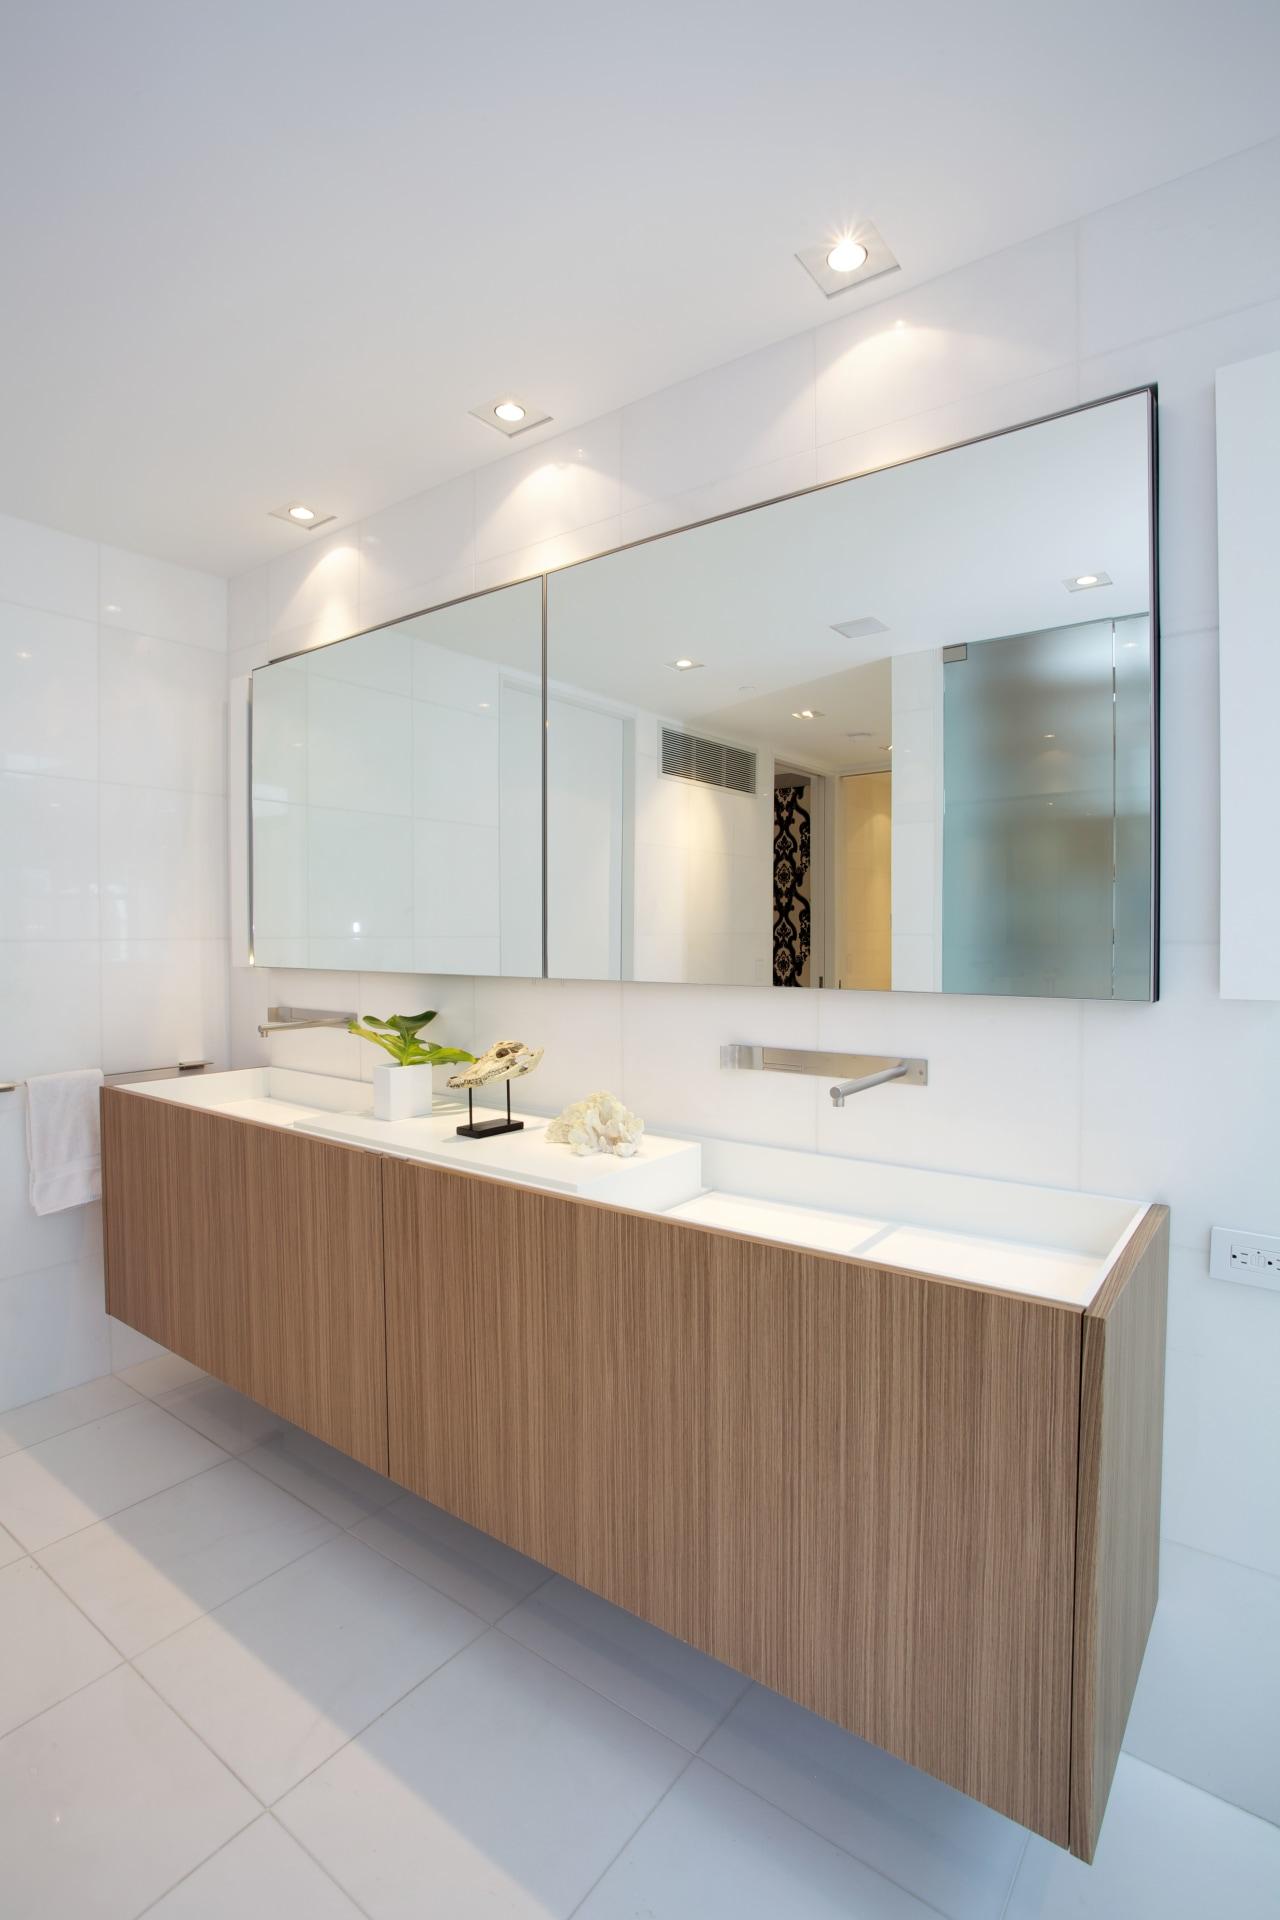 The cantilevered Boffi vanity features walnut wood veneer bathroom, countertop, floor, interior design, kitchen, product design, sink, gray, white